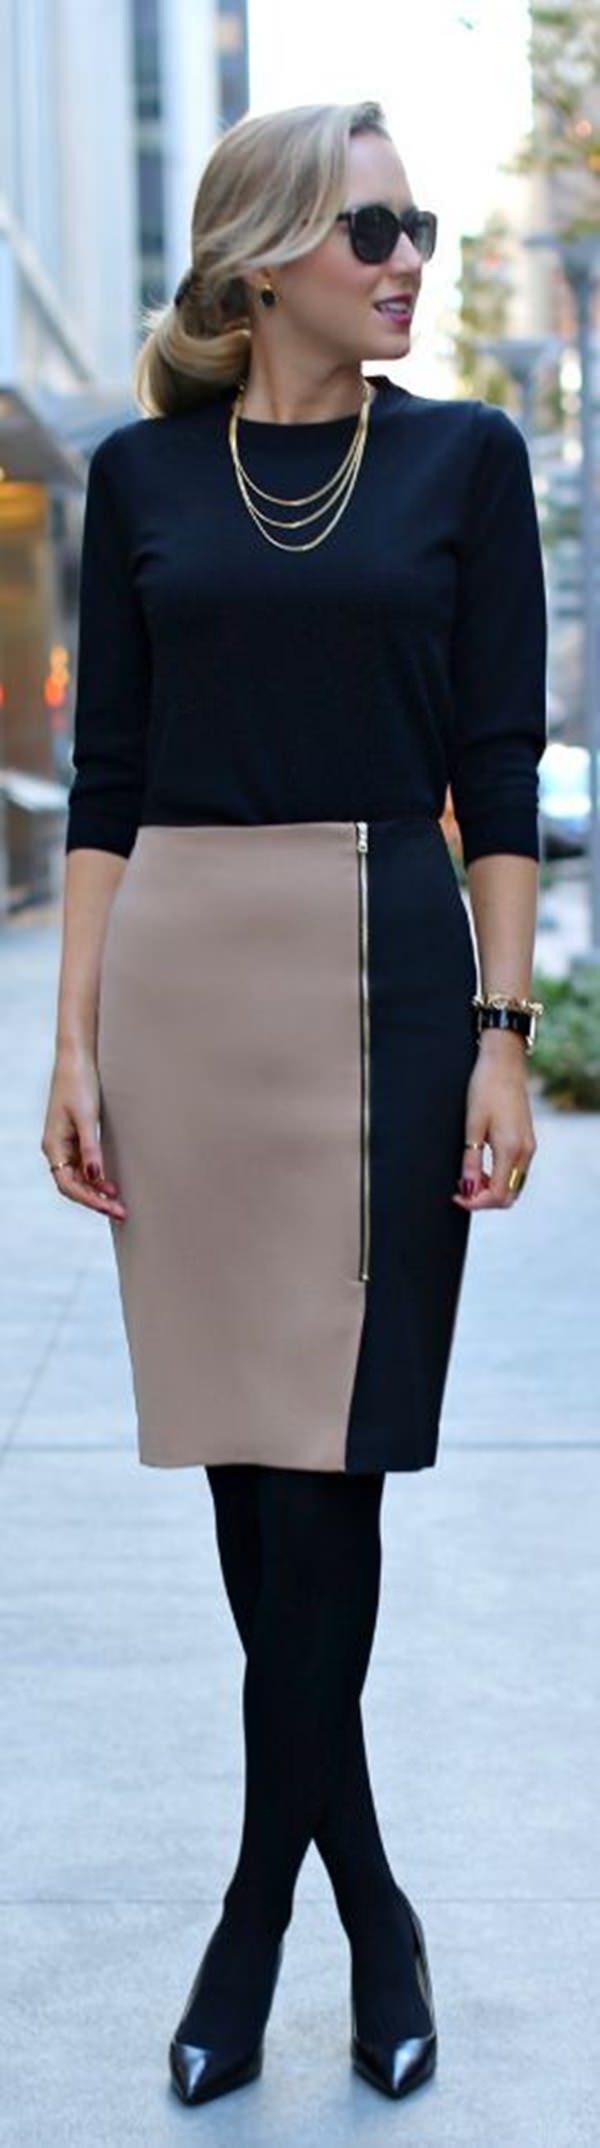 trajes de falda lápiz 44